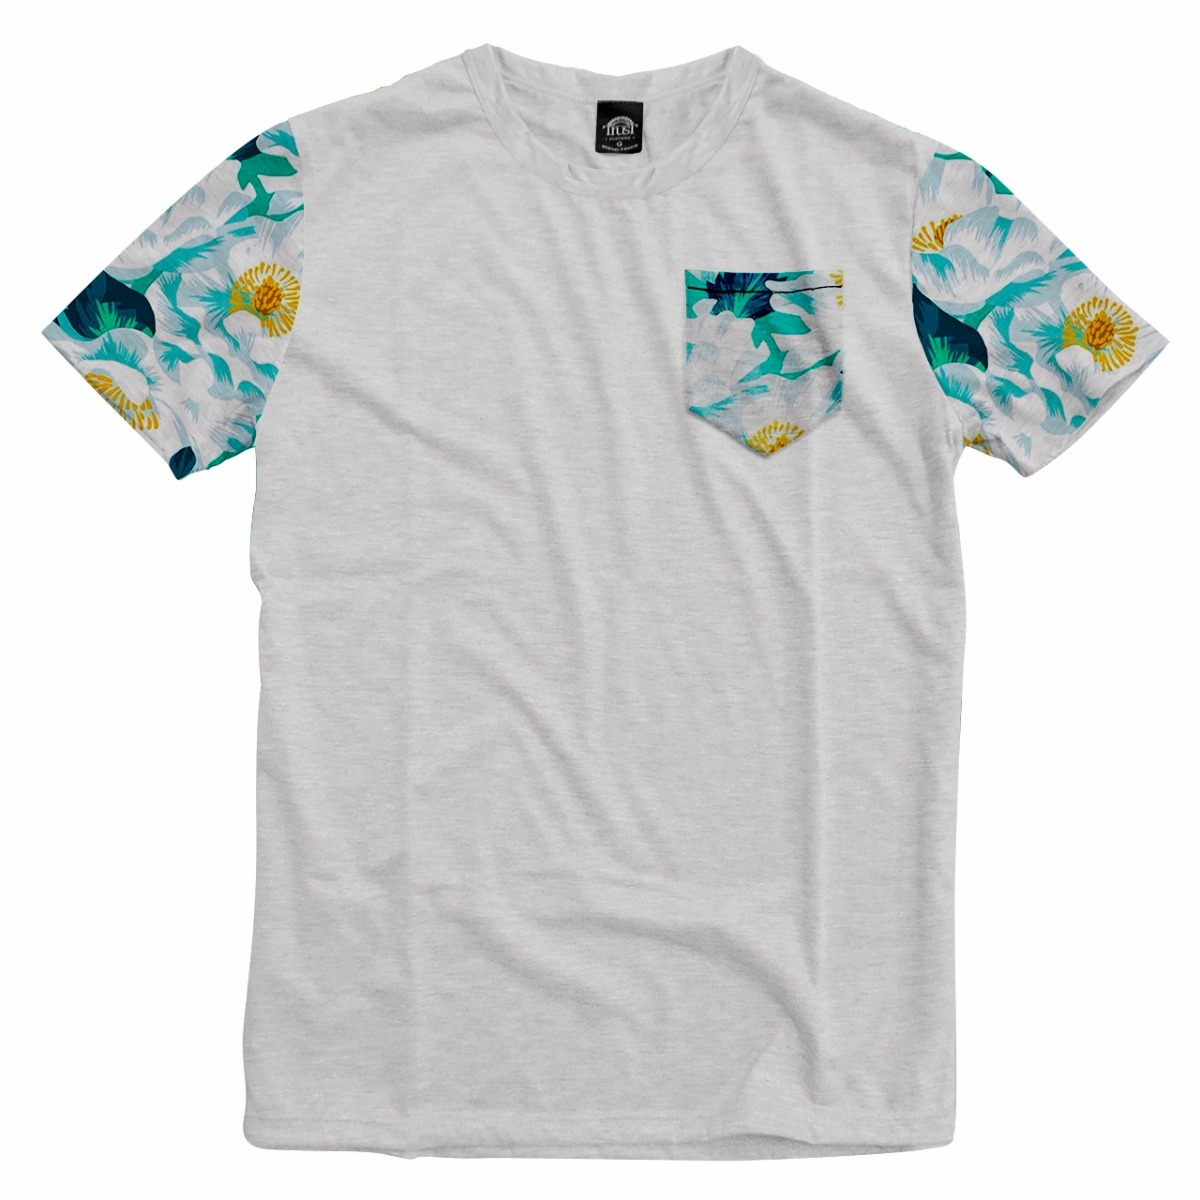 2cb1631d3 camiseta bolso swag mangas havaiana floral girassol. Carregando zoom.